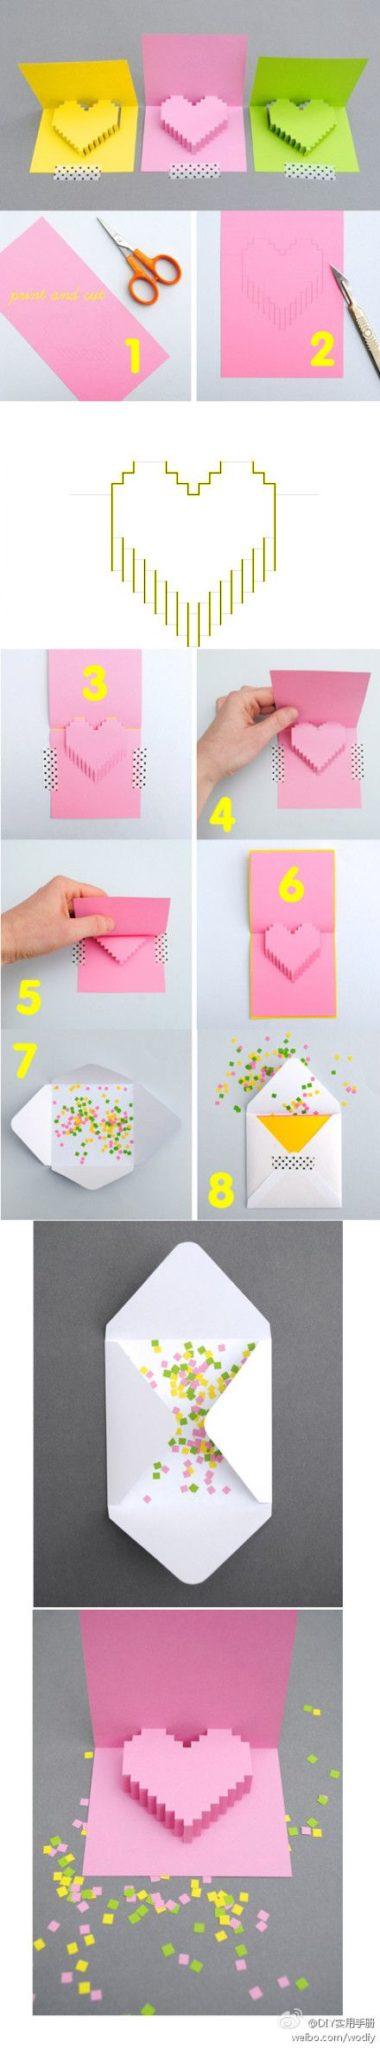 tarjetas popup de kirigami para cumpleaños